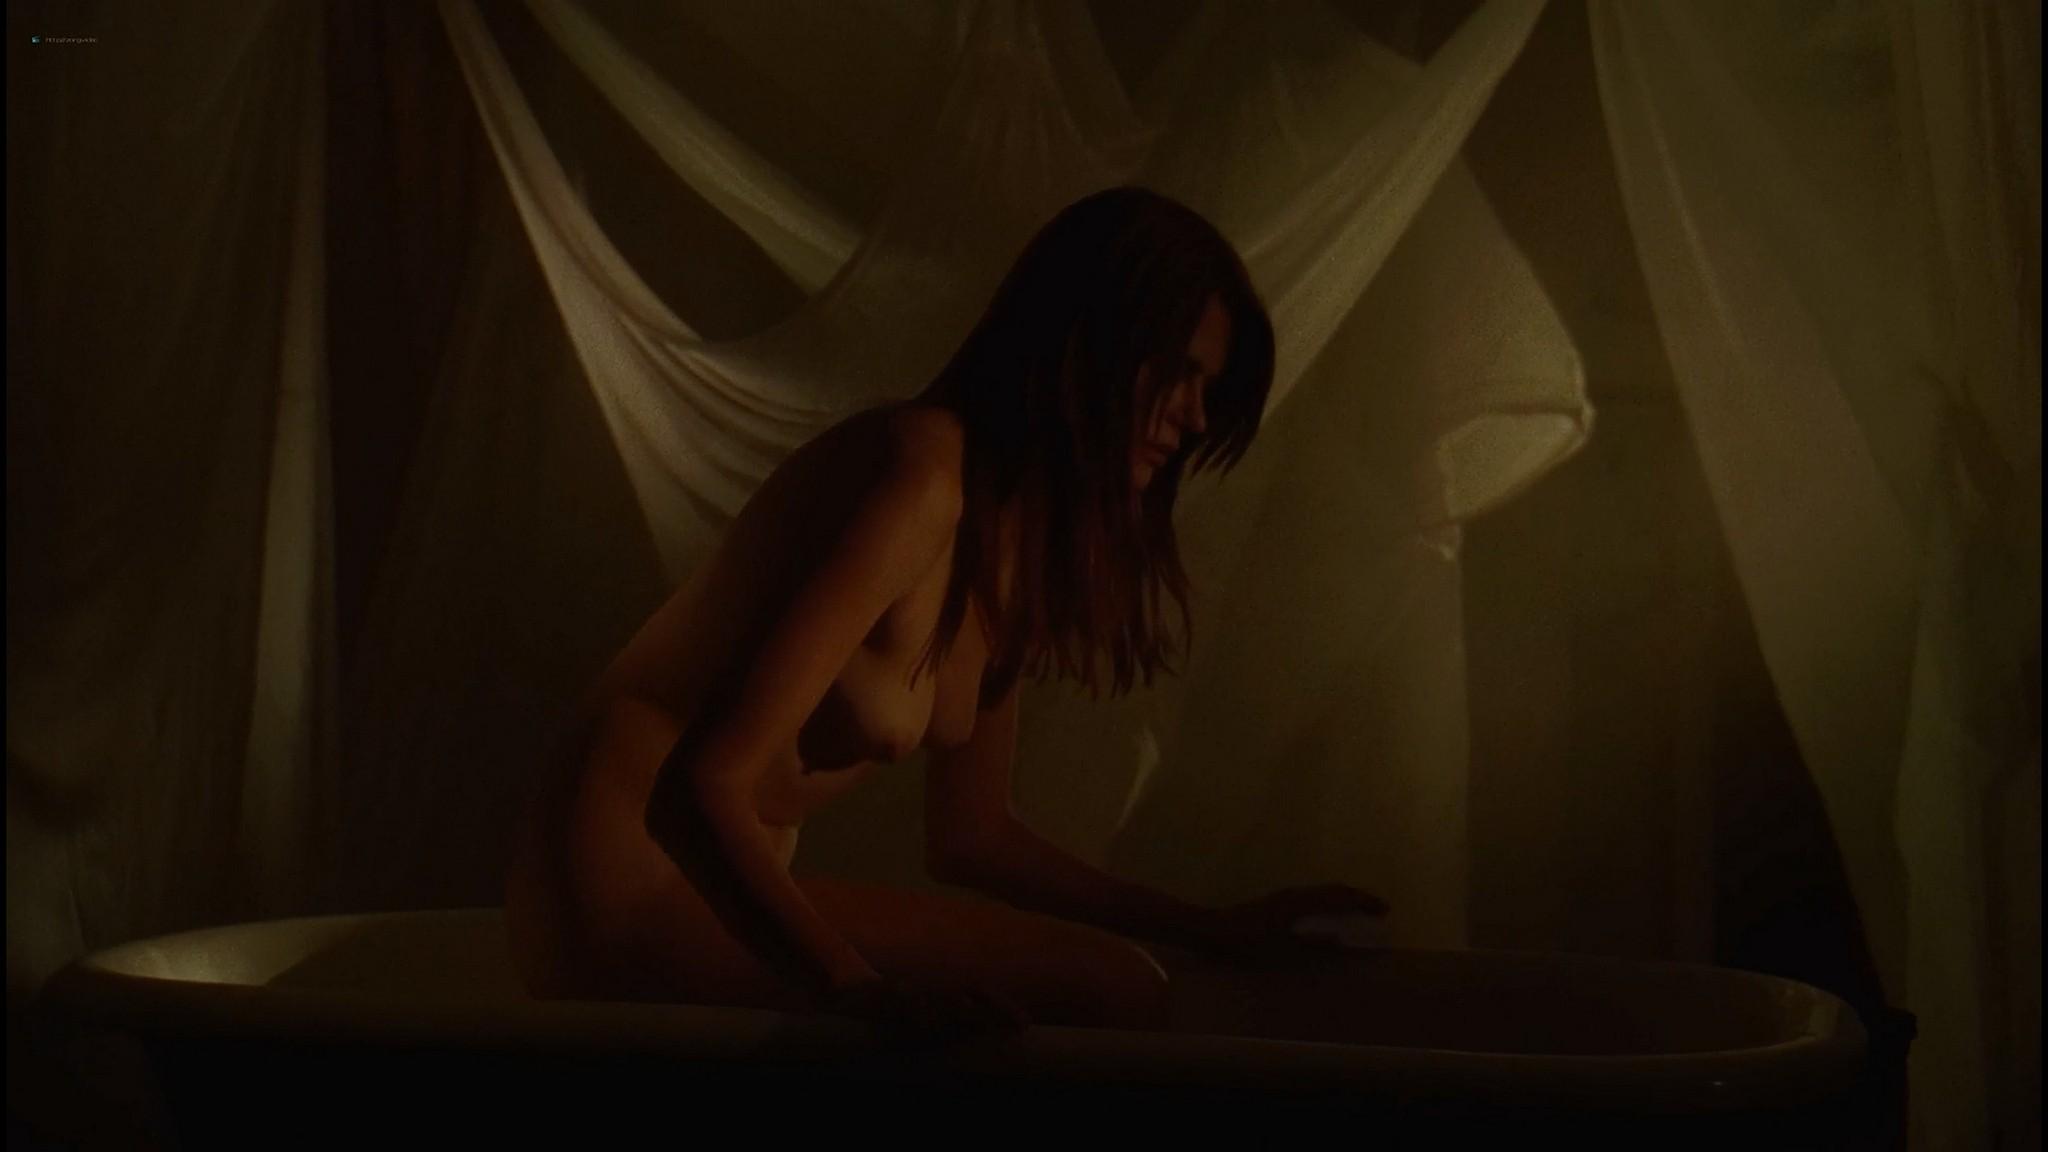 Serena Scott Thomas nude sex Sarah Lassez and others nude too Brothel 2008 1080p Web 6